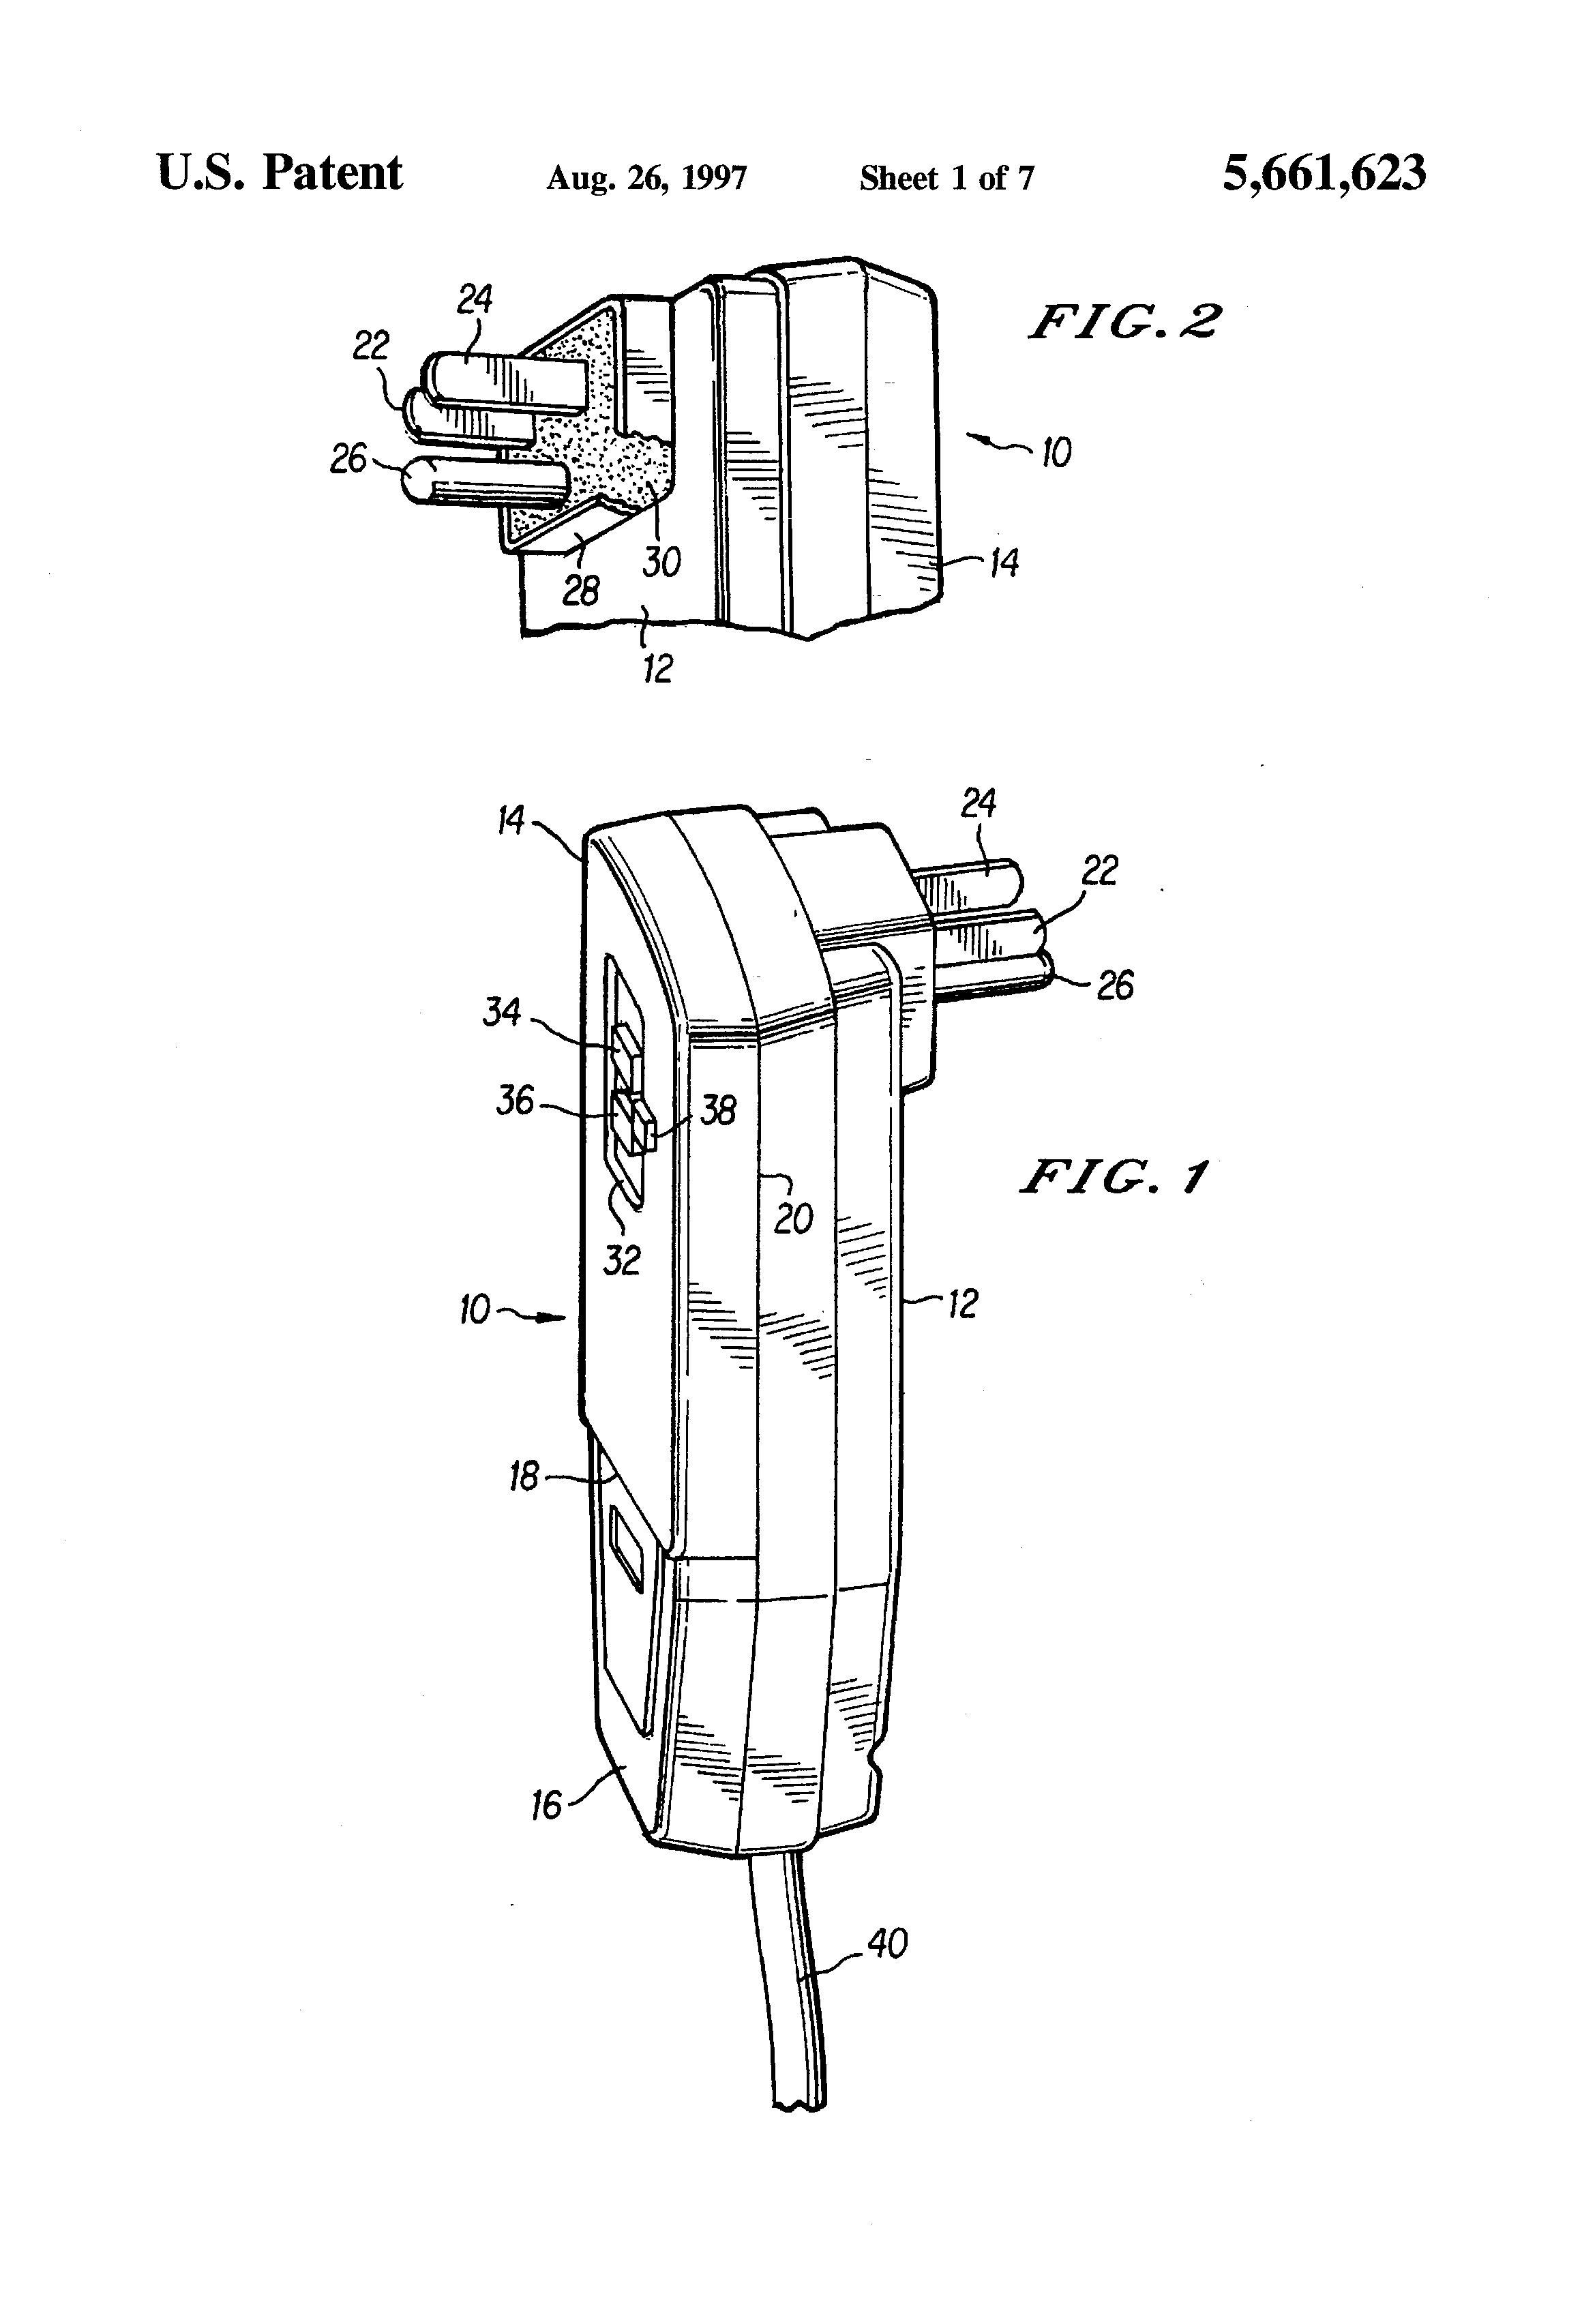 patent us5661623 - ground fault circuit interrupter plug